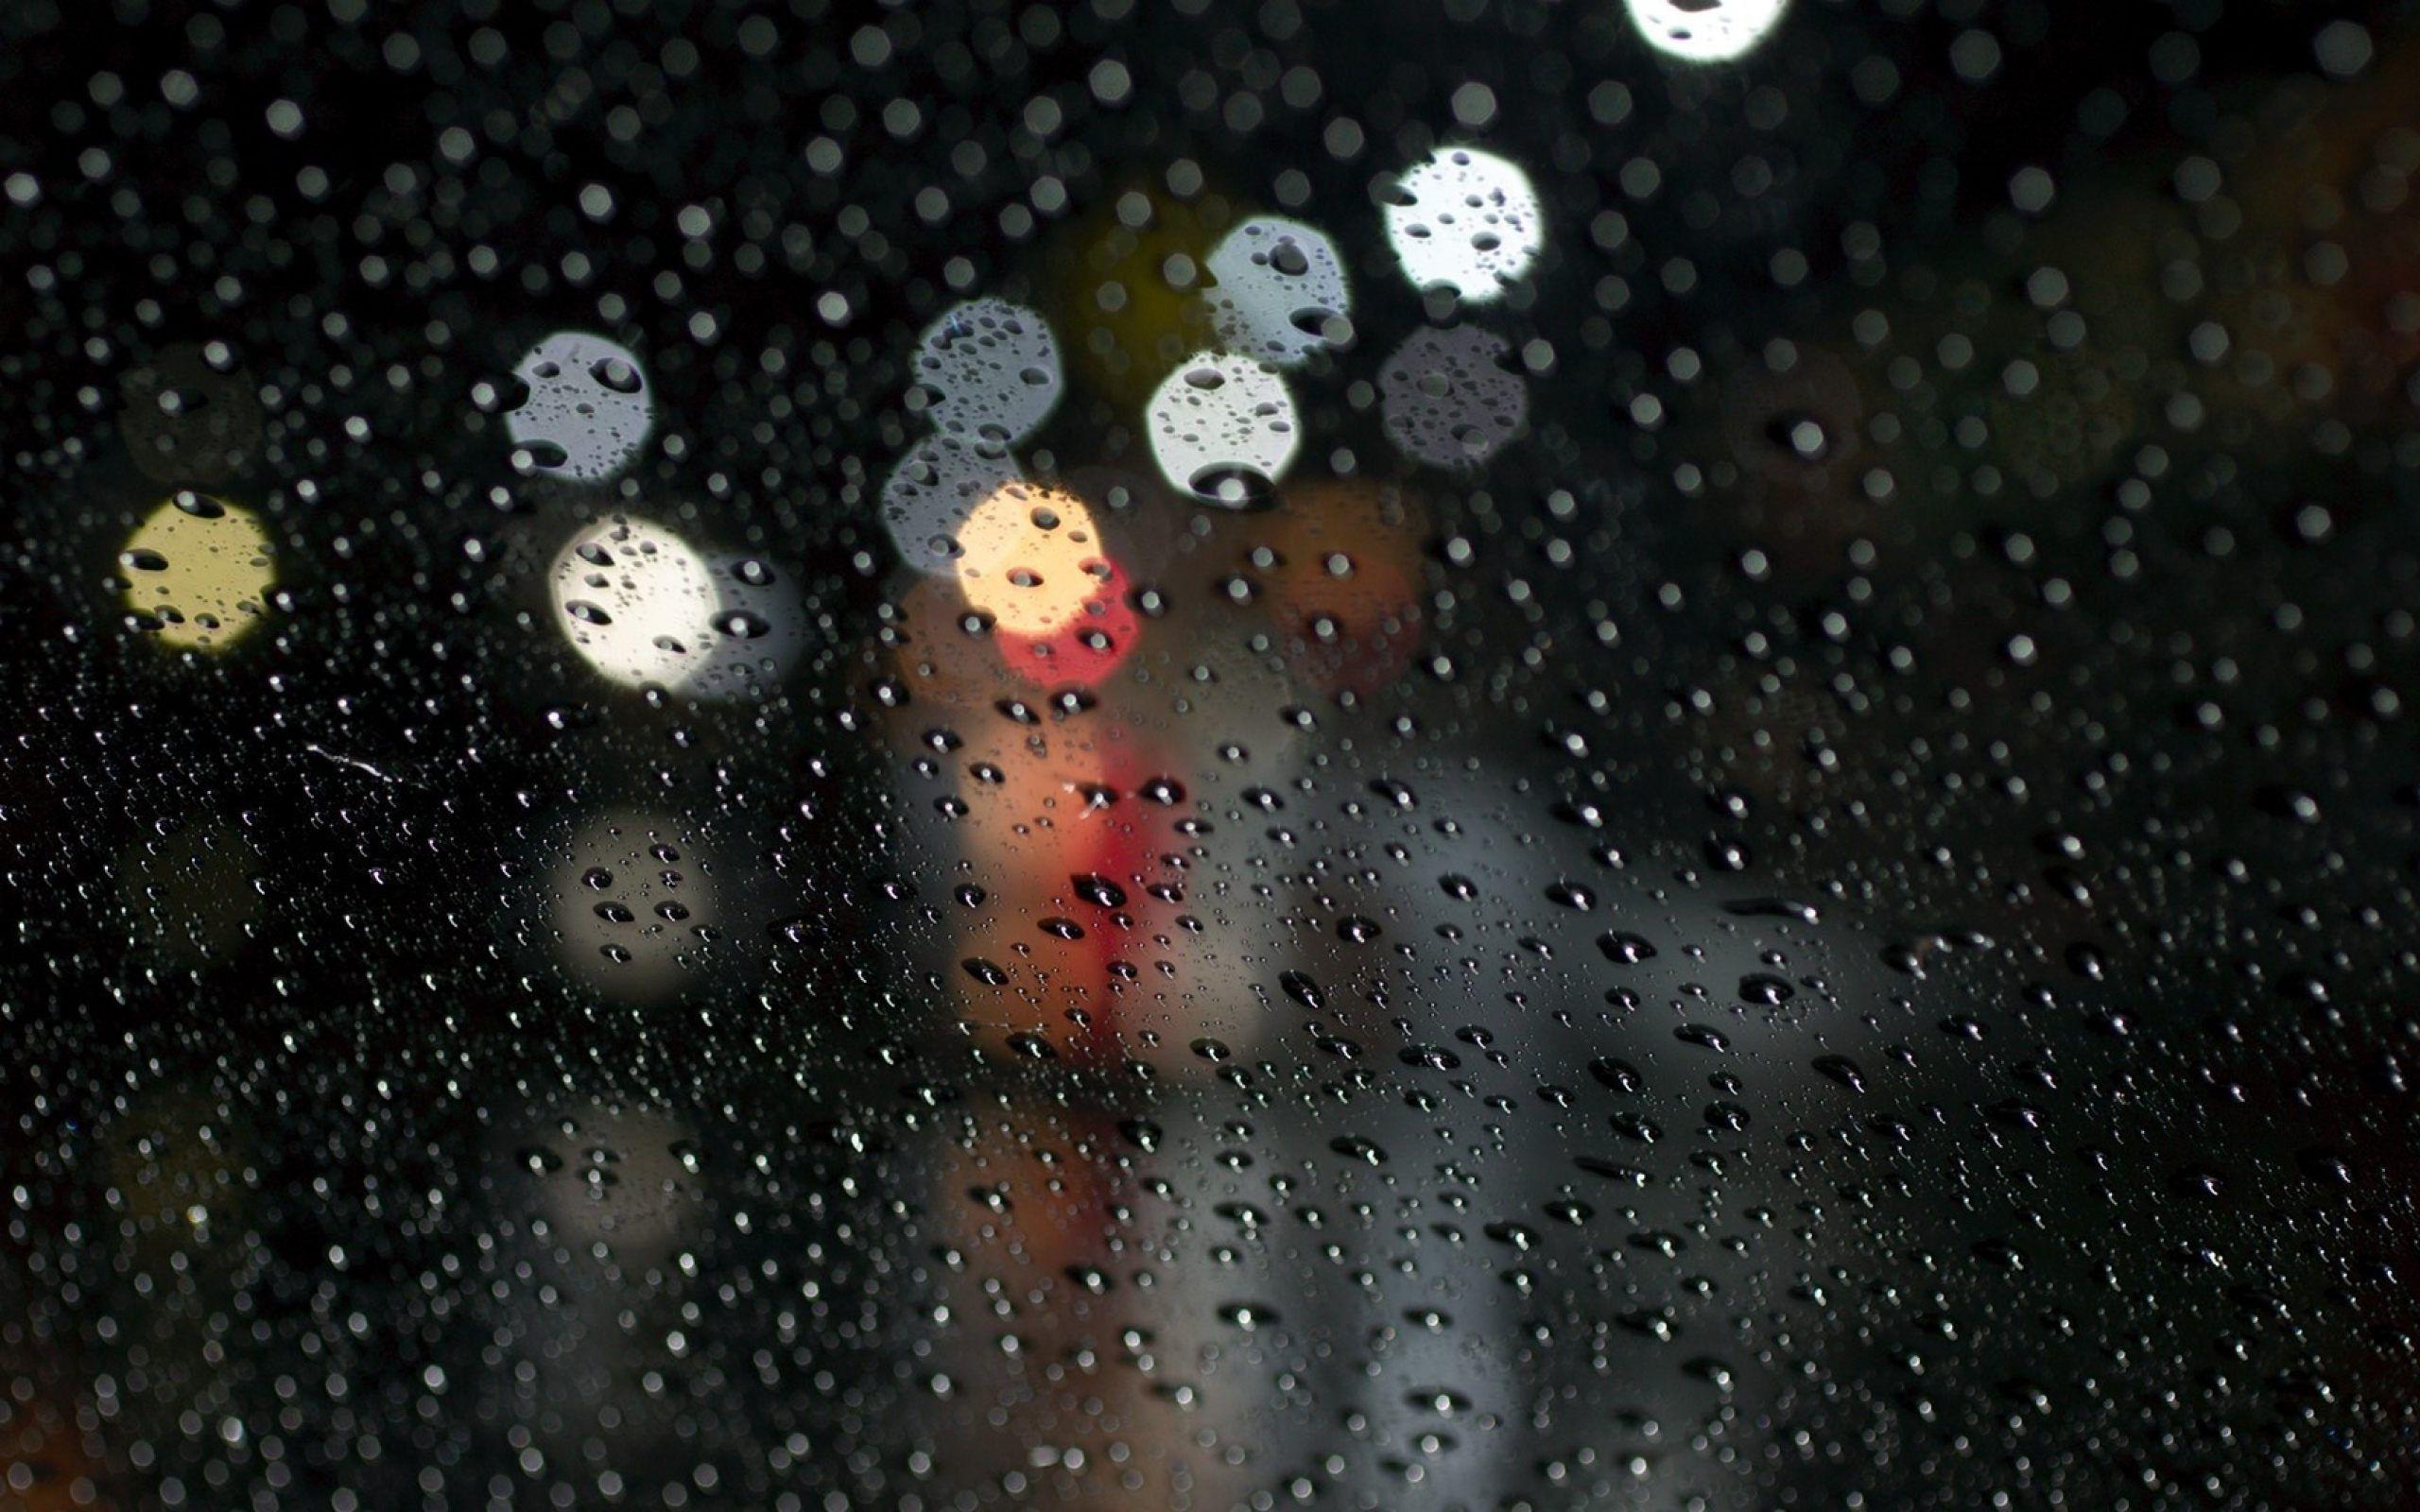 Rain Background For Desktop Wallpaper 2560 X 1600 Px 1 2 Mb